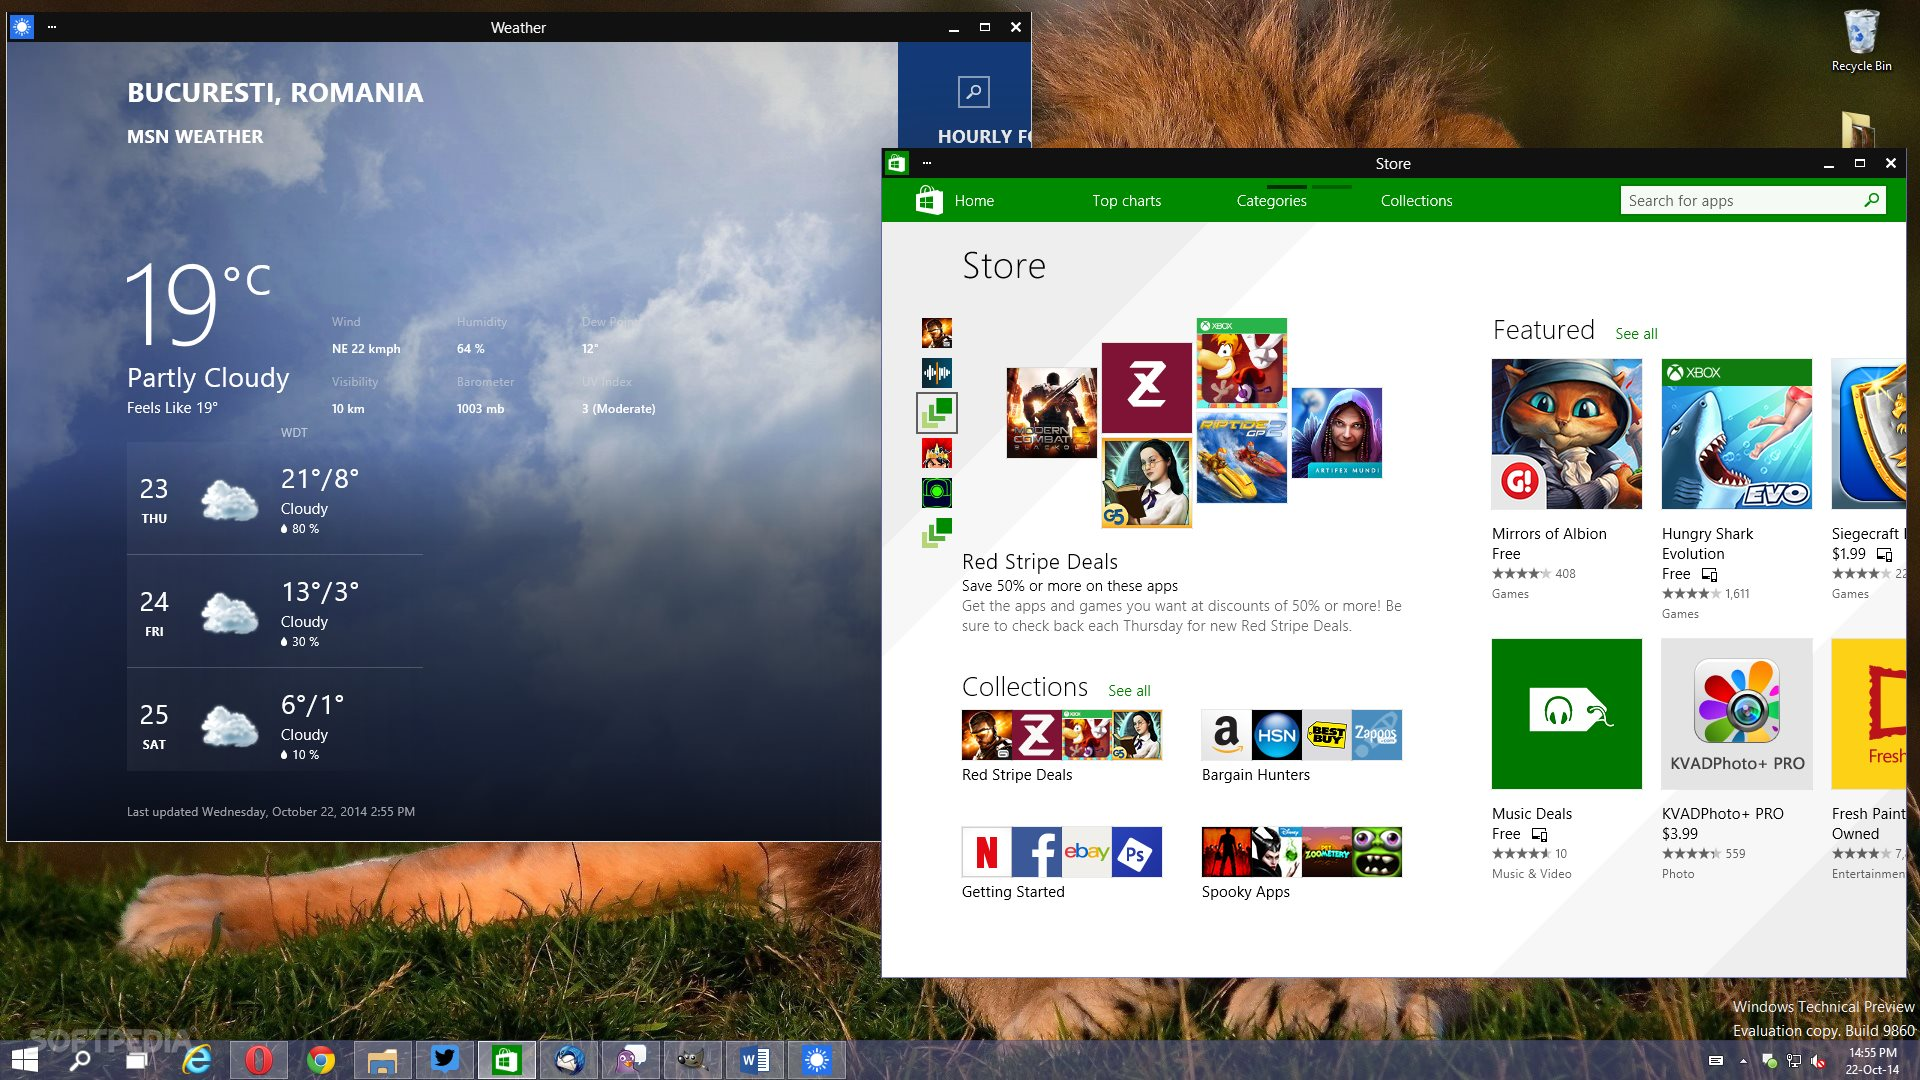 New Windows 10 build